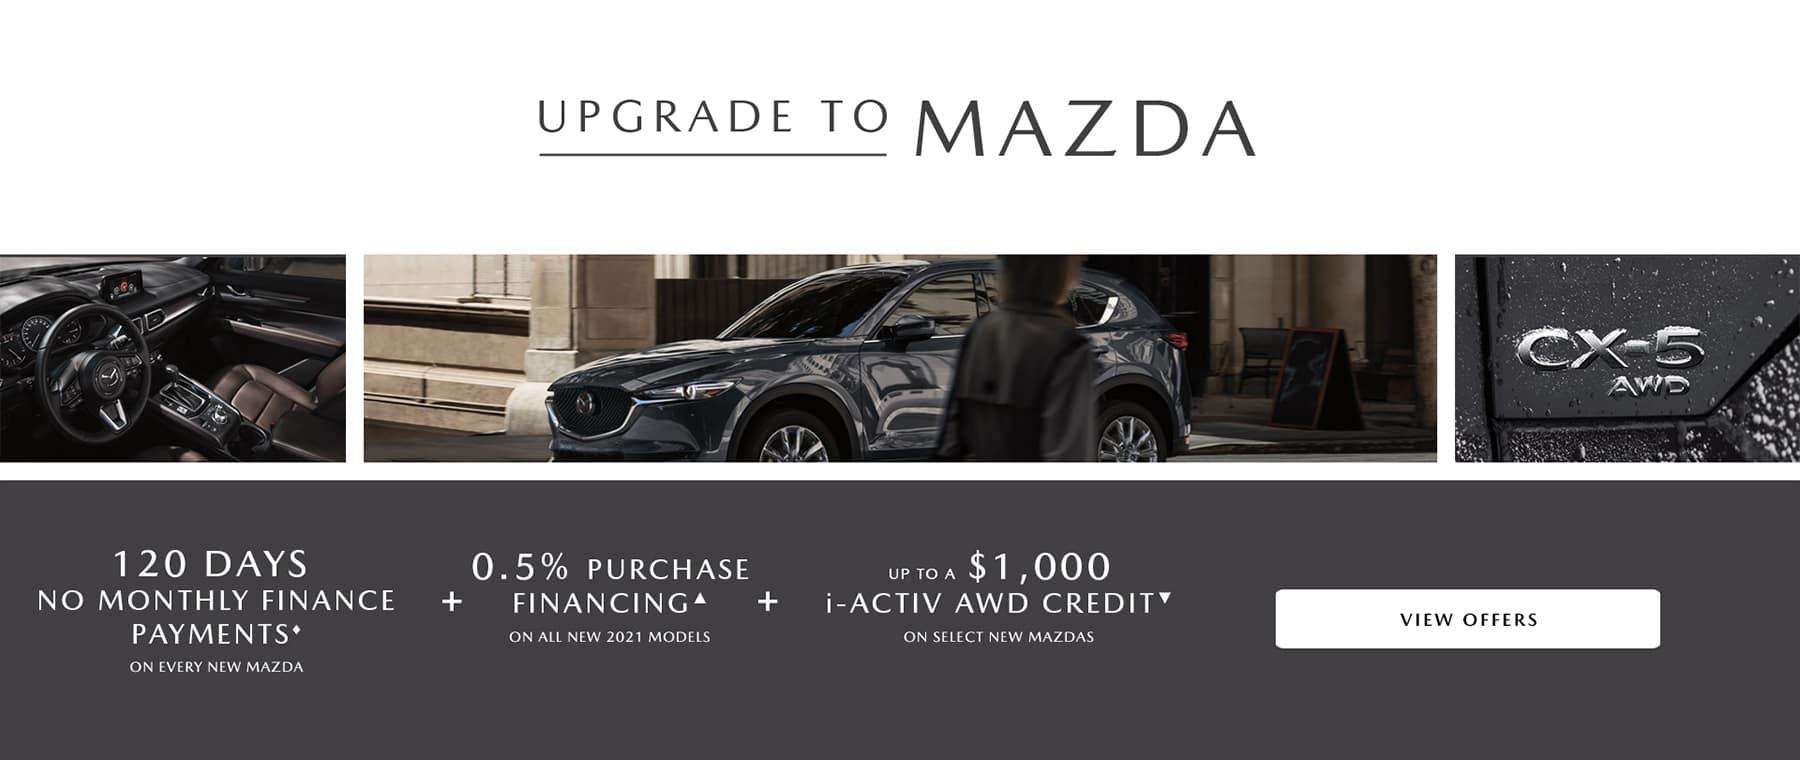 Upgrade to Mazda Event January 2021